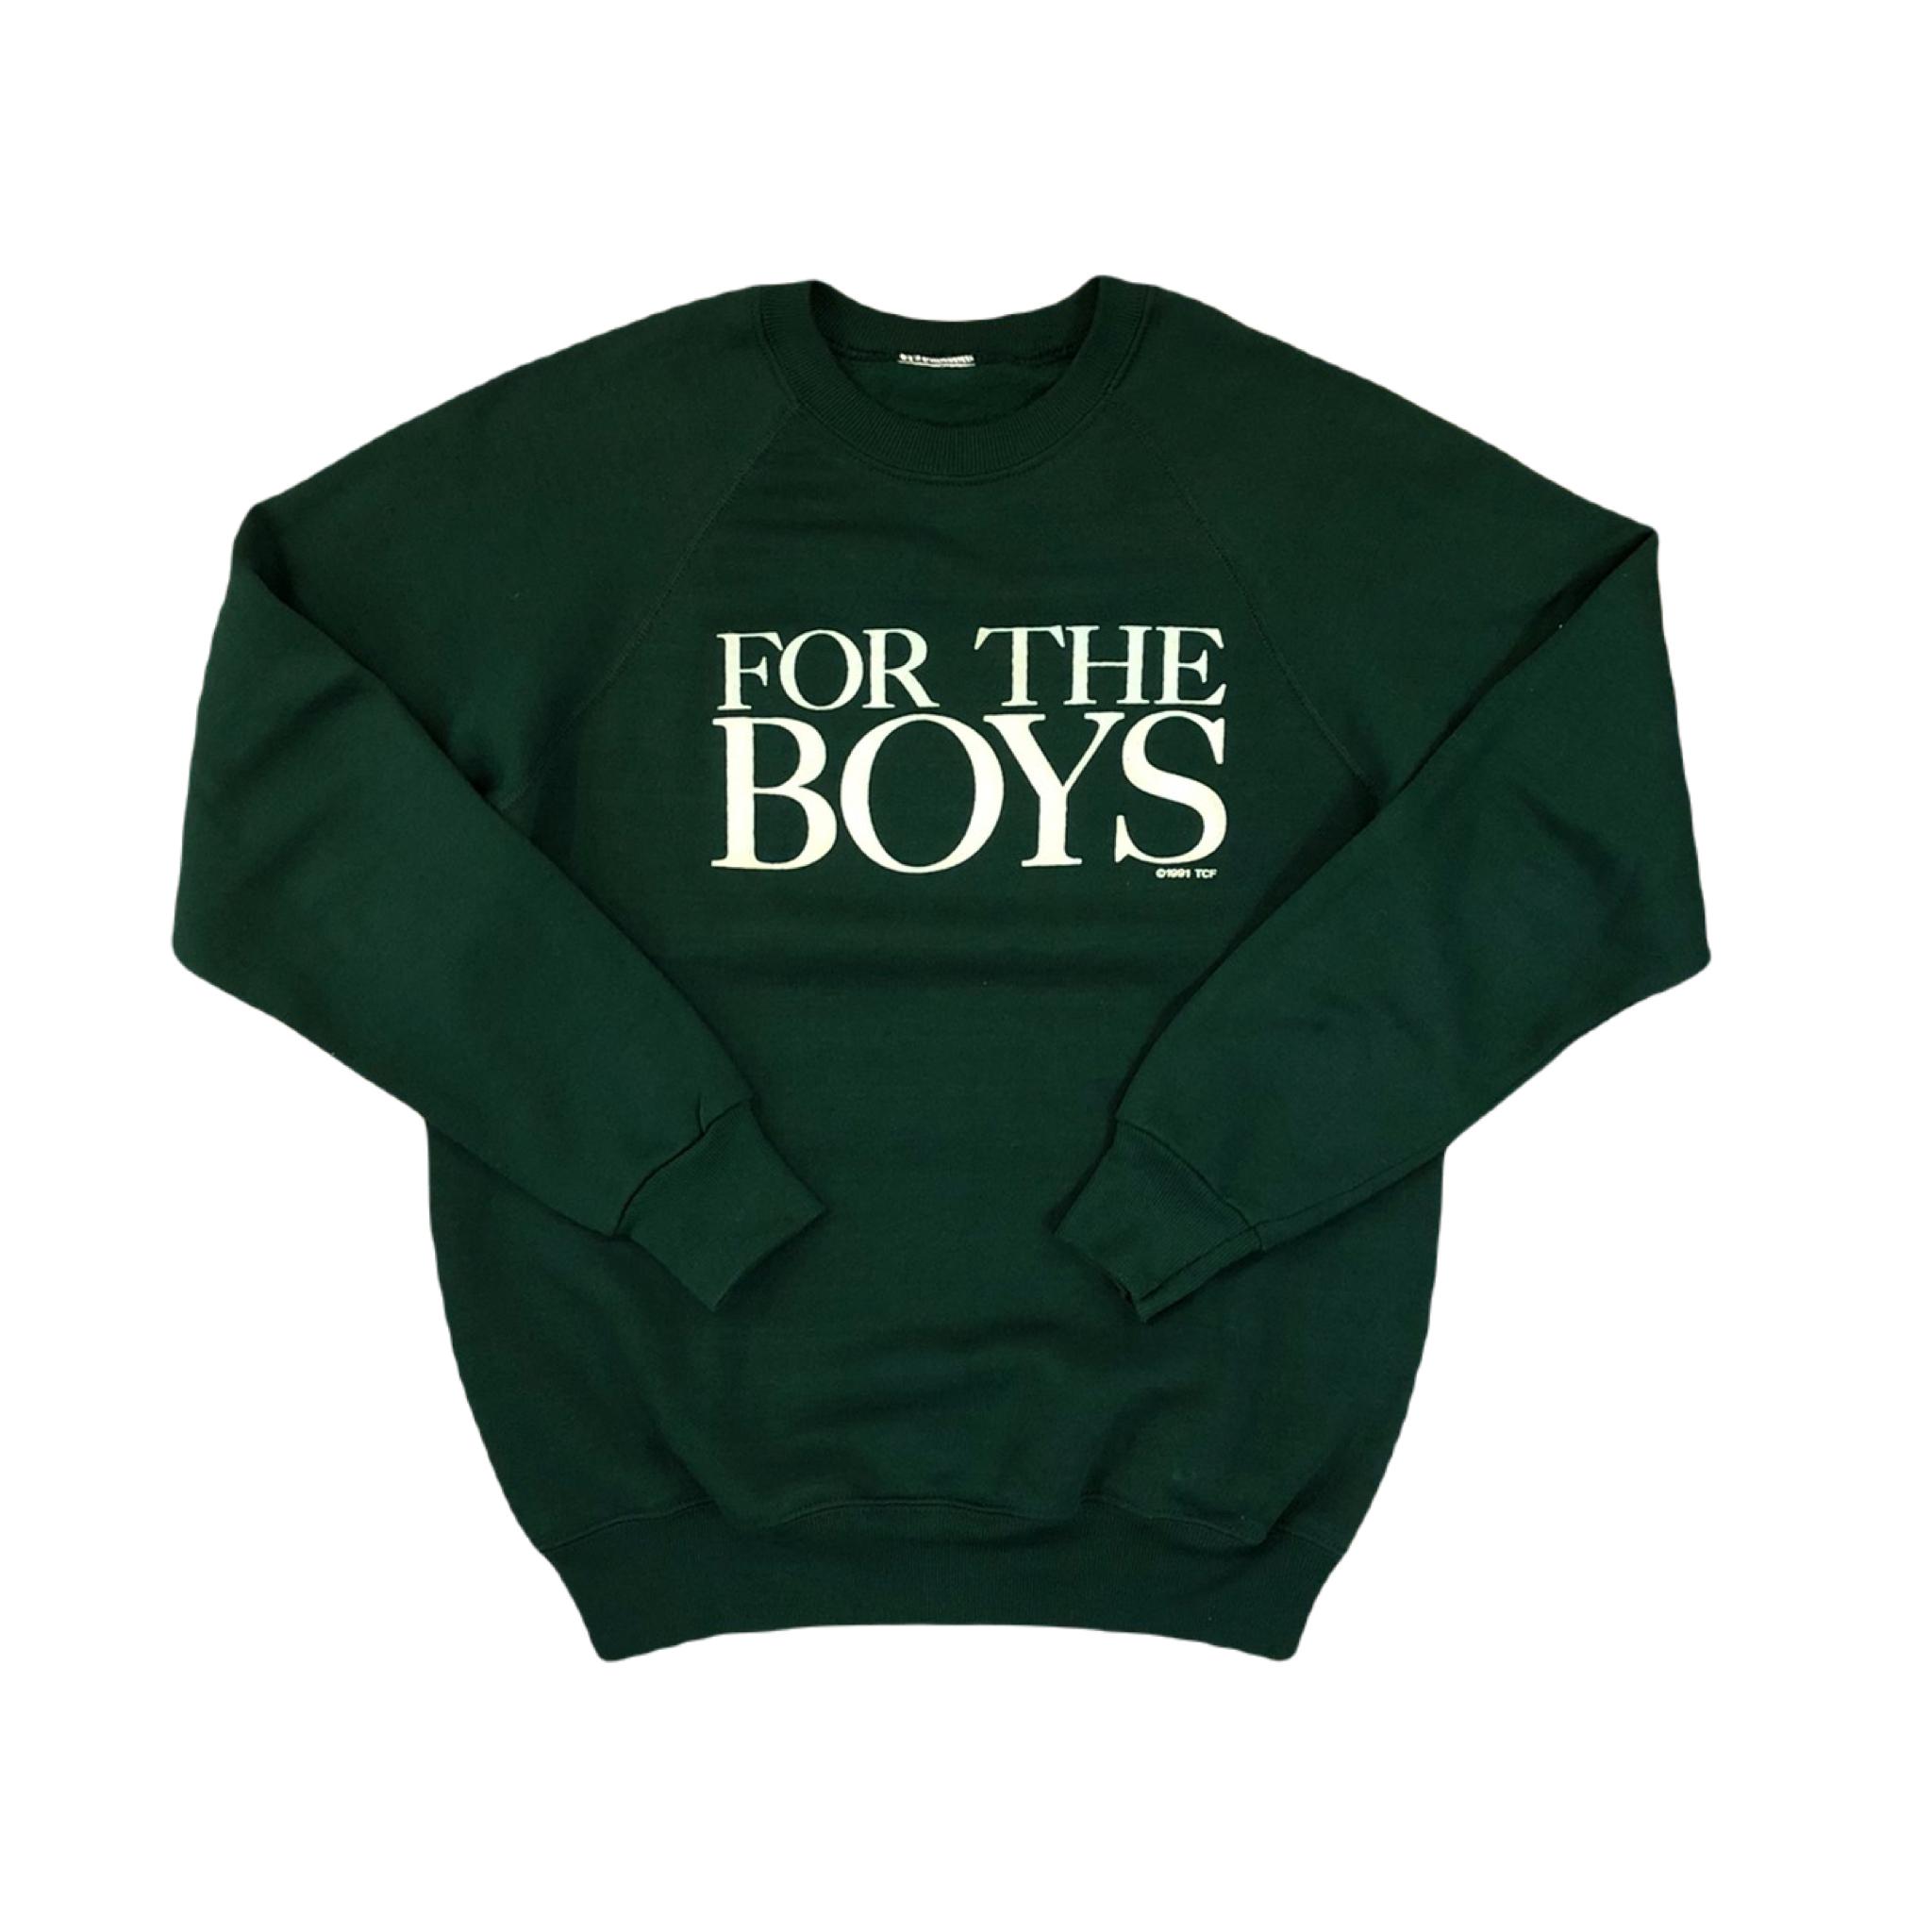 For The Boys Raglan Sweatshirt ¥5,200+tax